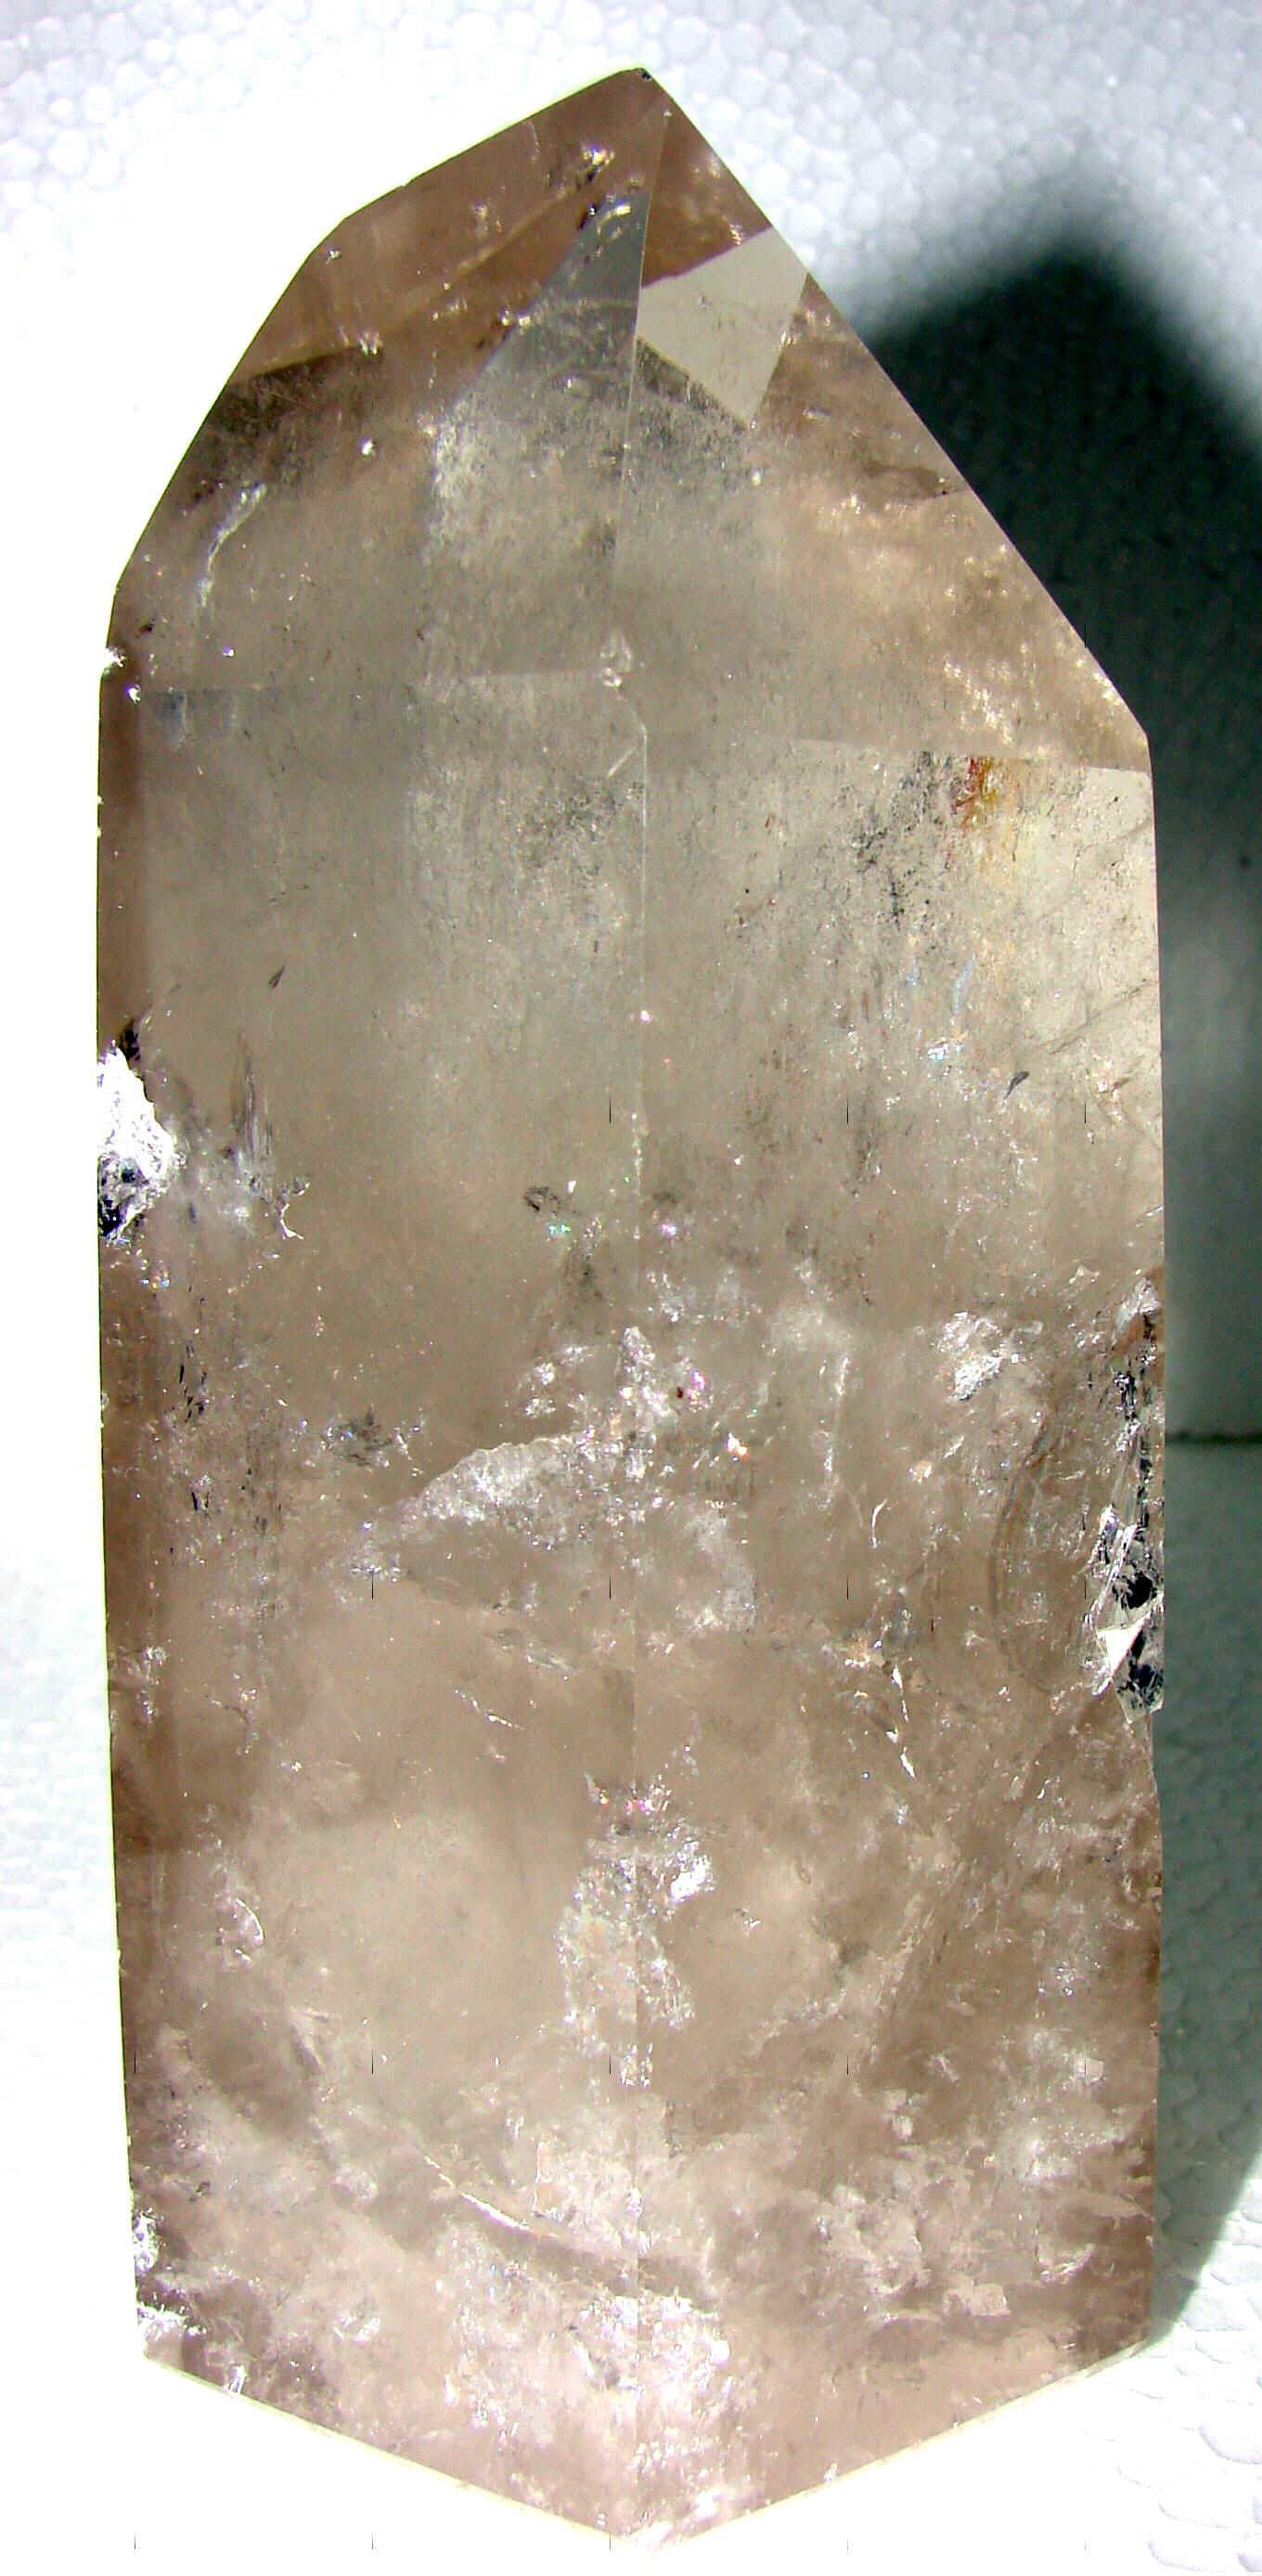 http://www.quartzcrystals.net/nusmok-2.jpg (807370 bytes)